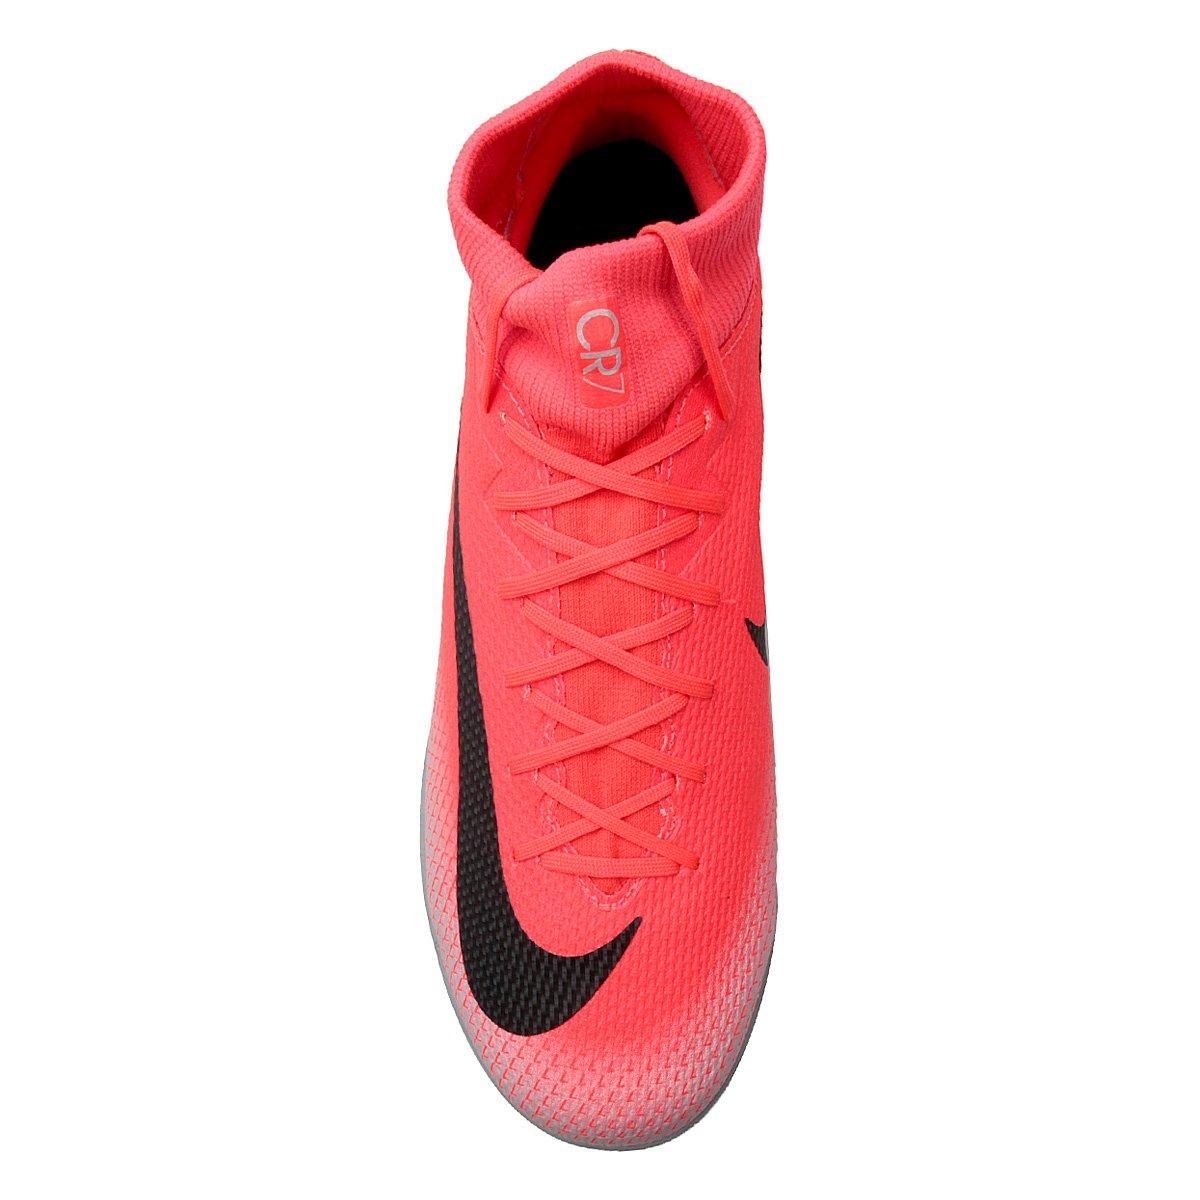 e8f69e2259 Chuteira Futsal Nike Mercurial Superfly 6 Academy CR7 IC - Tam  44 ...